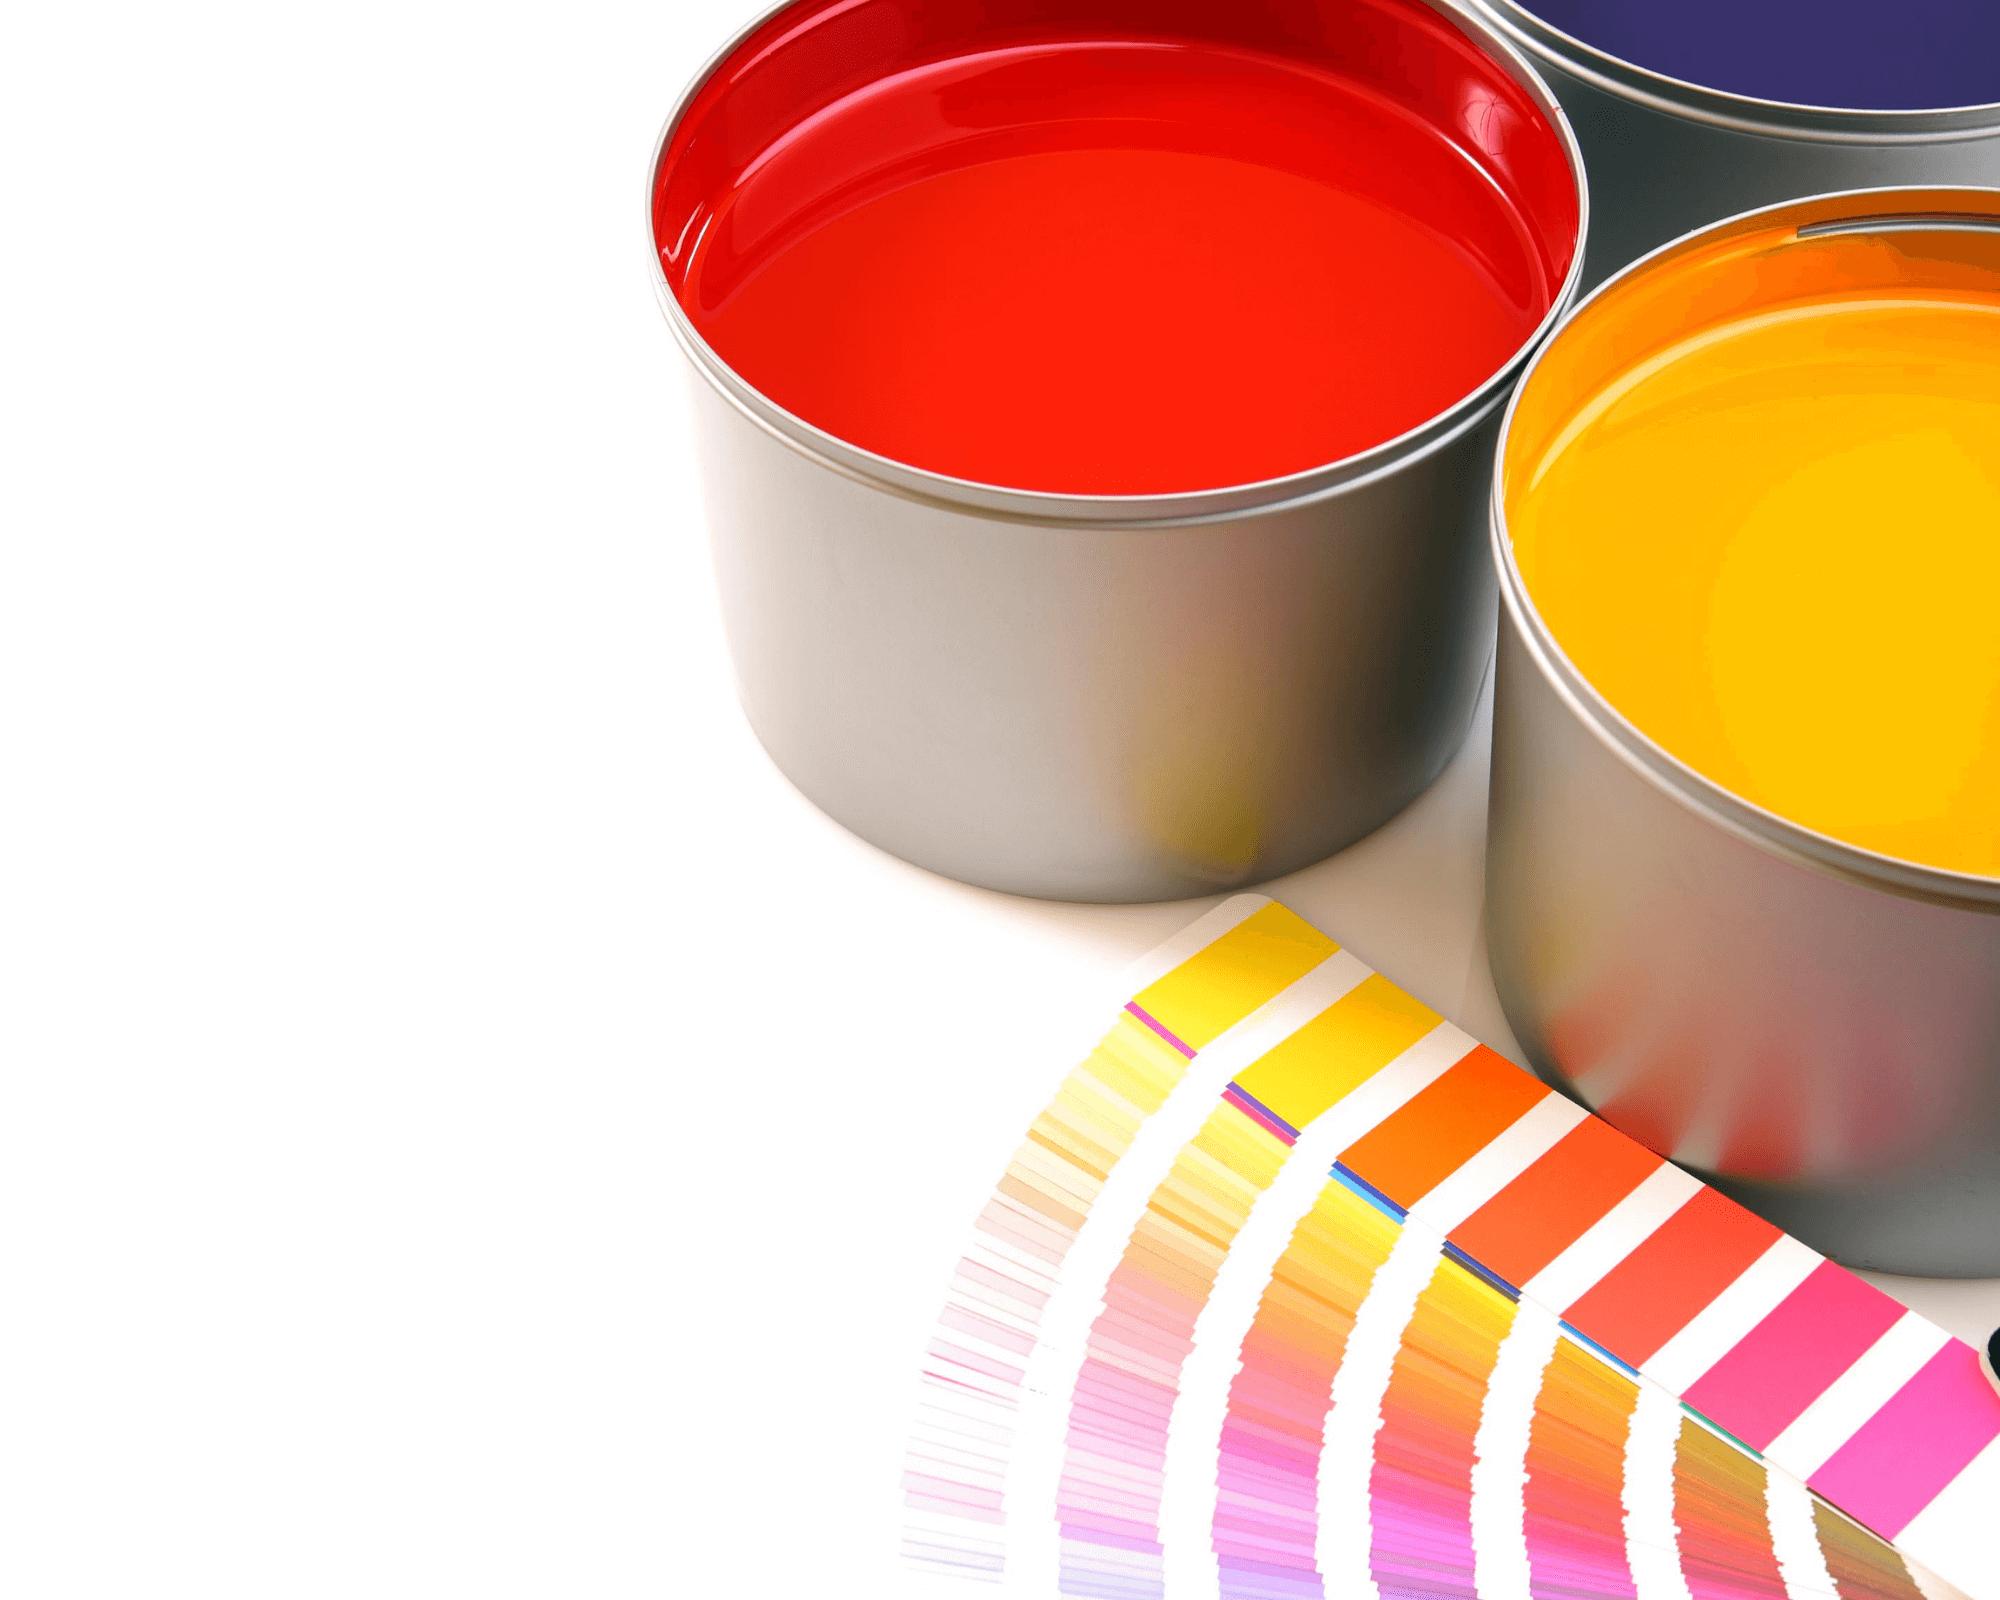 botes de pintura de diversos colores